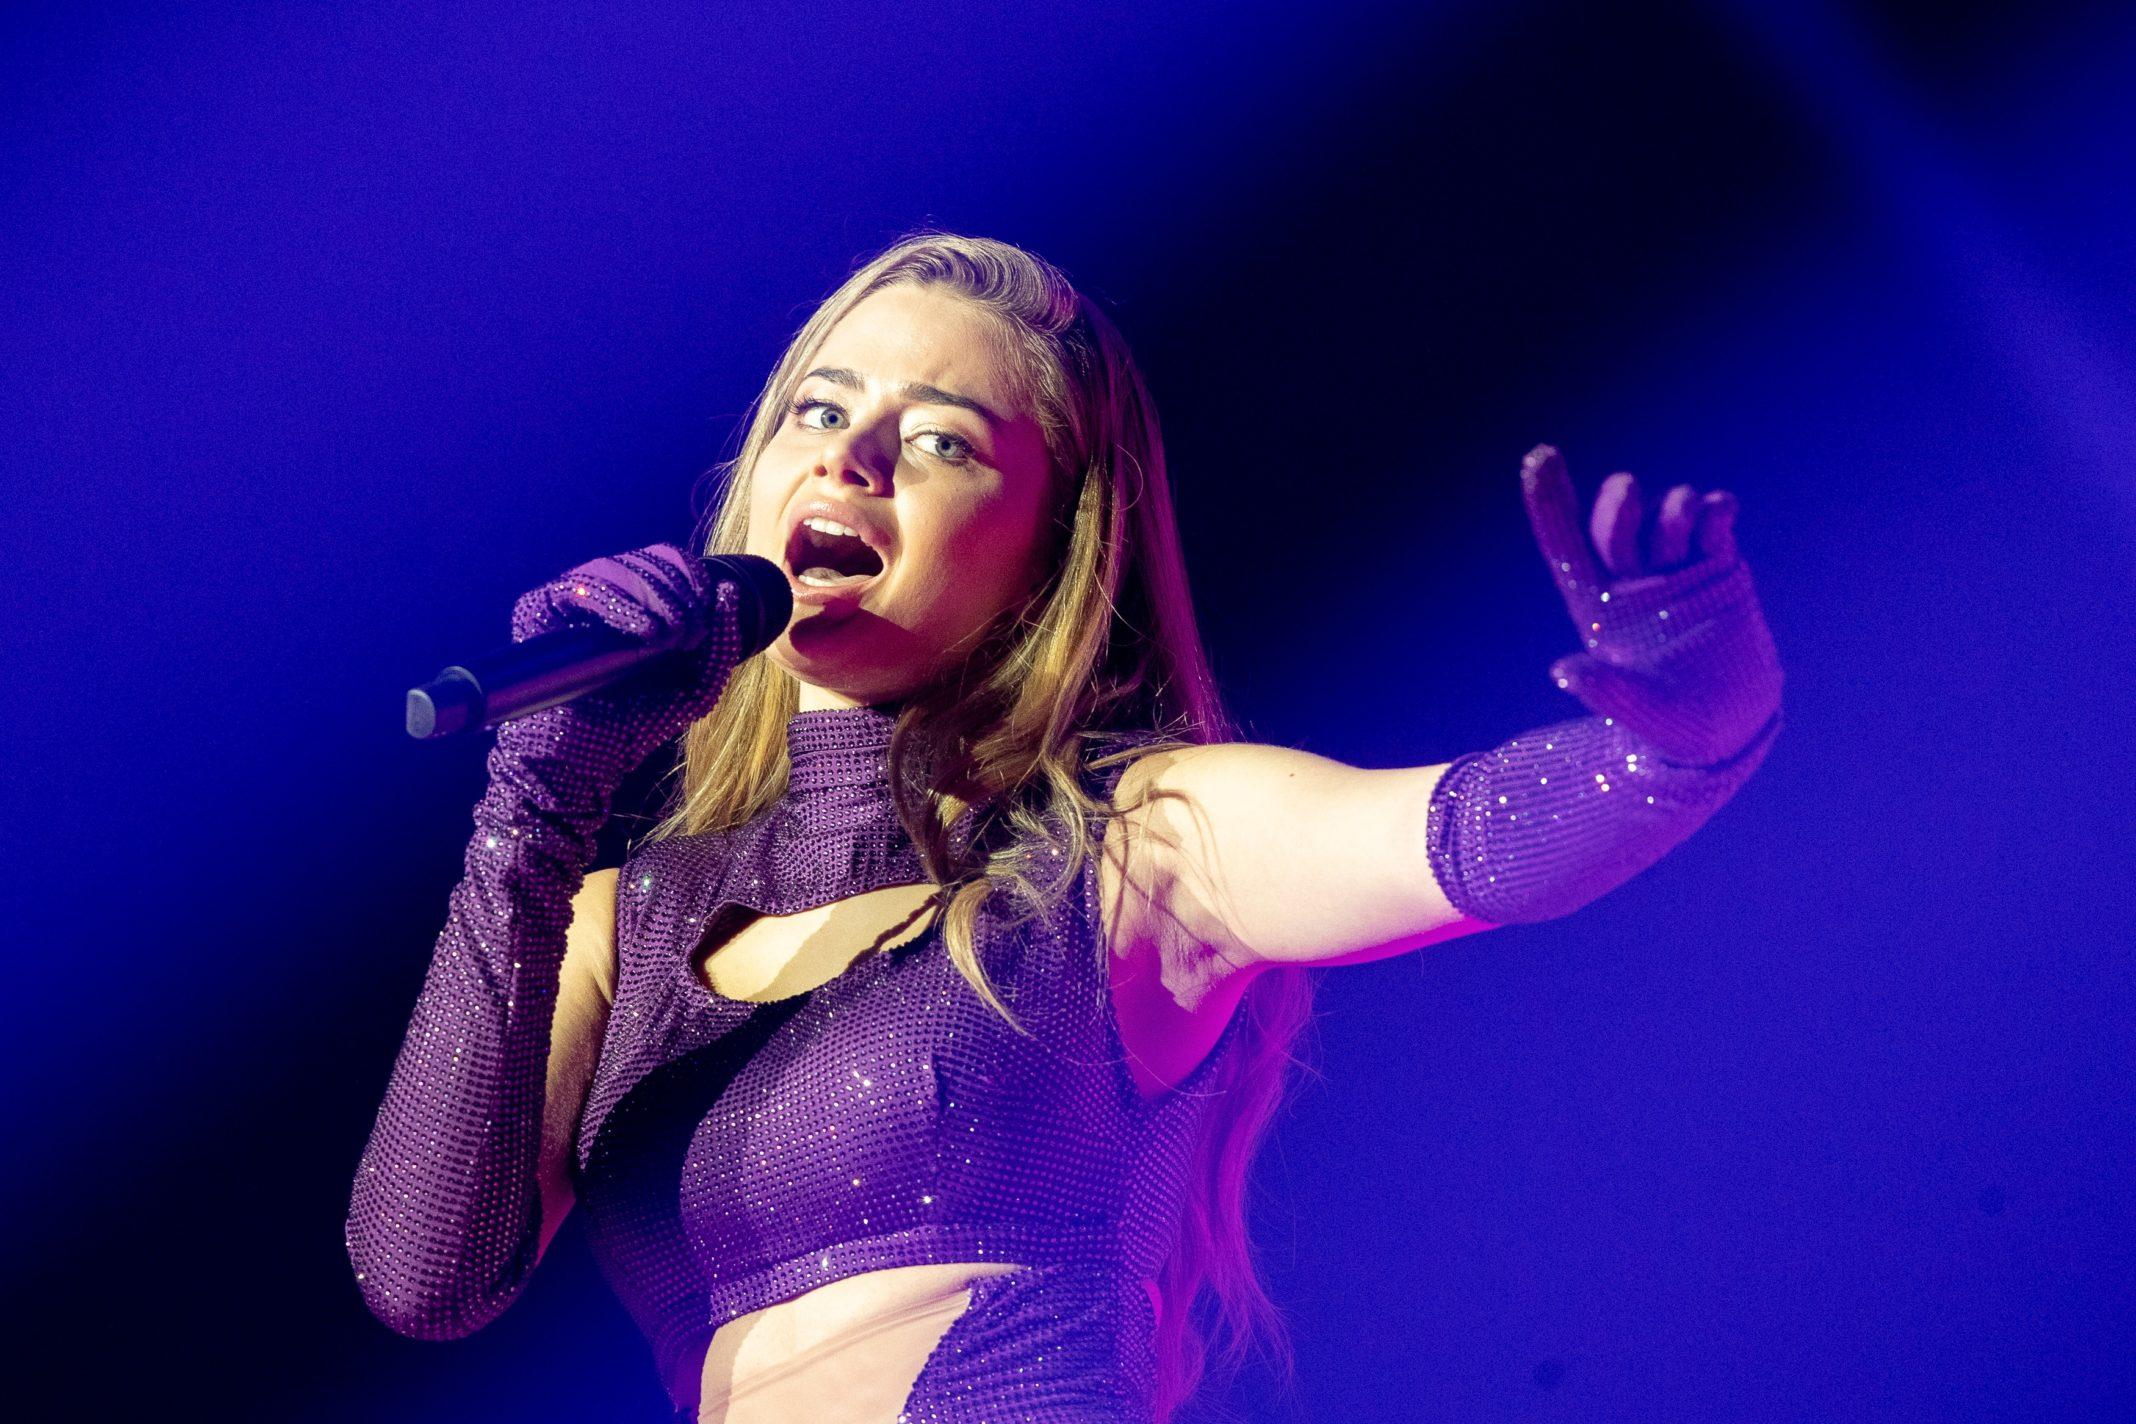 Eurovision 2021: Τι ώρα είναι ο Β' ημιτελικός – Live από την ΕΡΤ